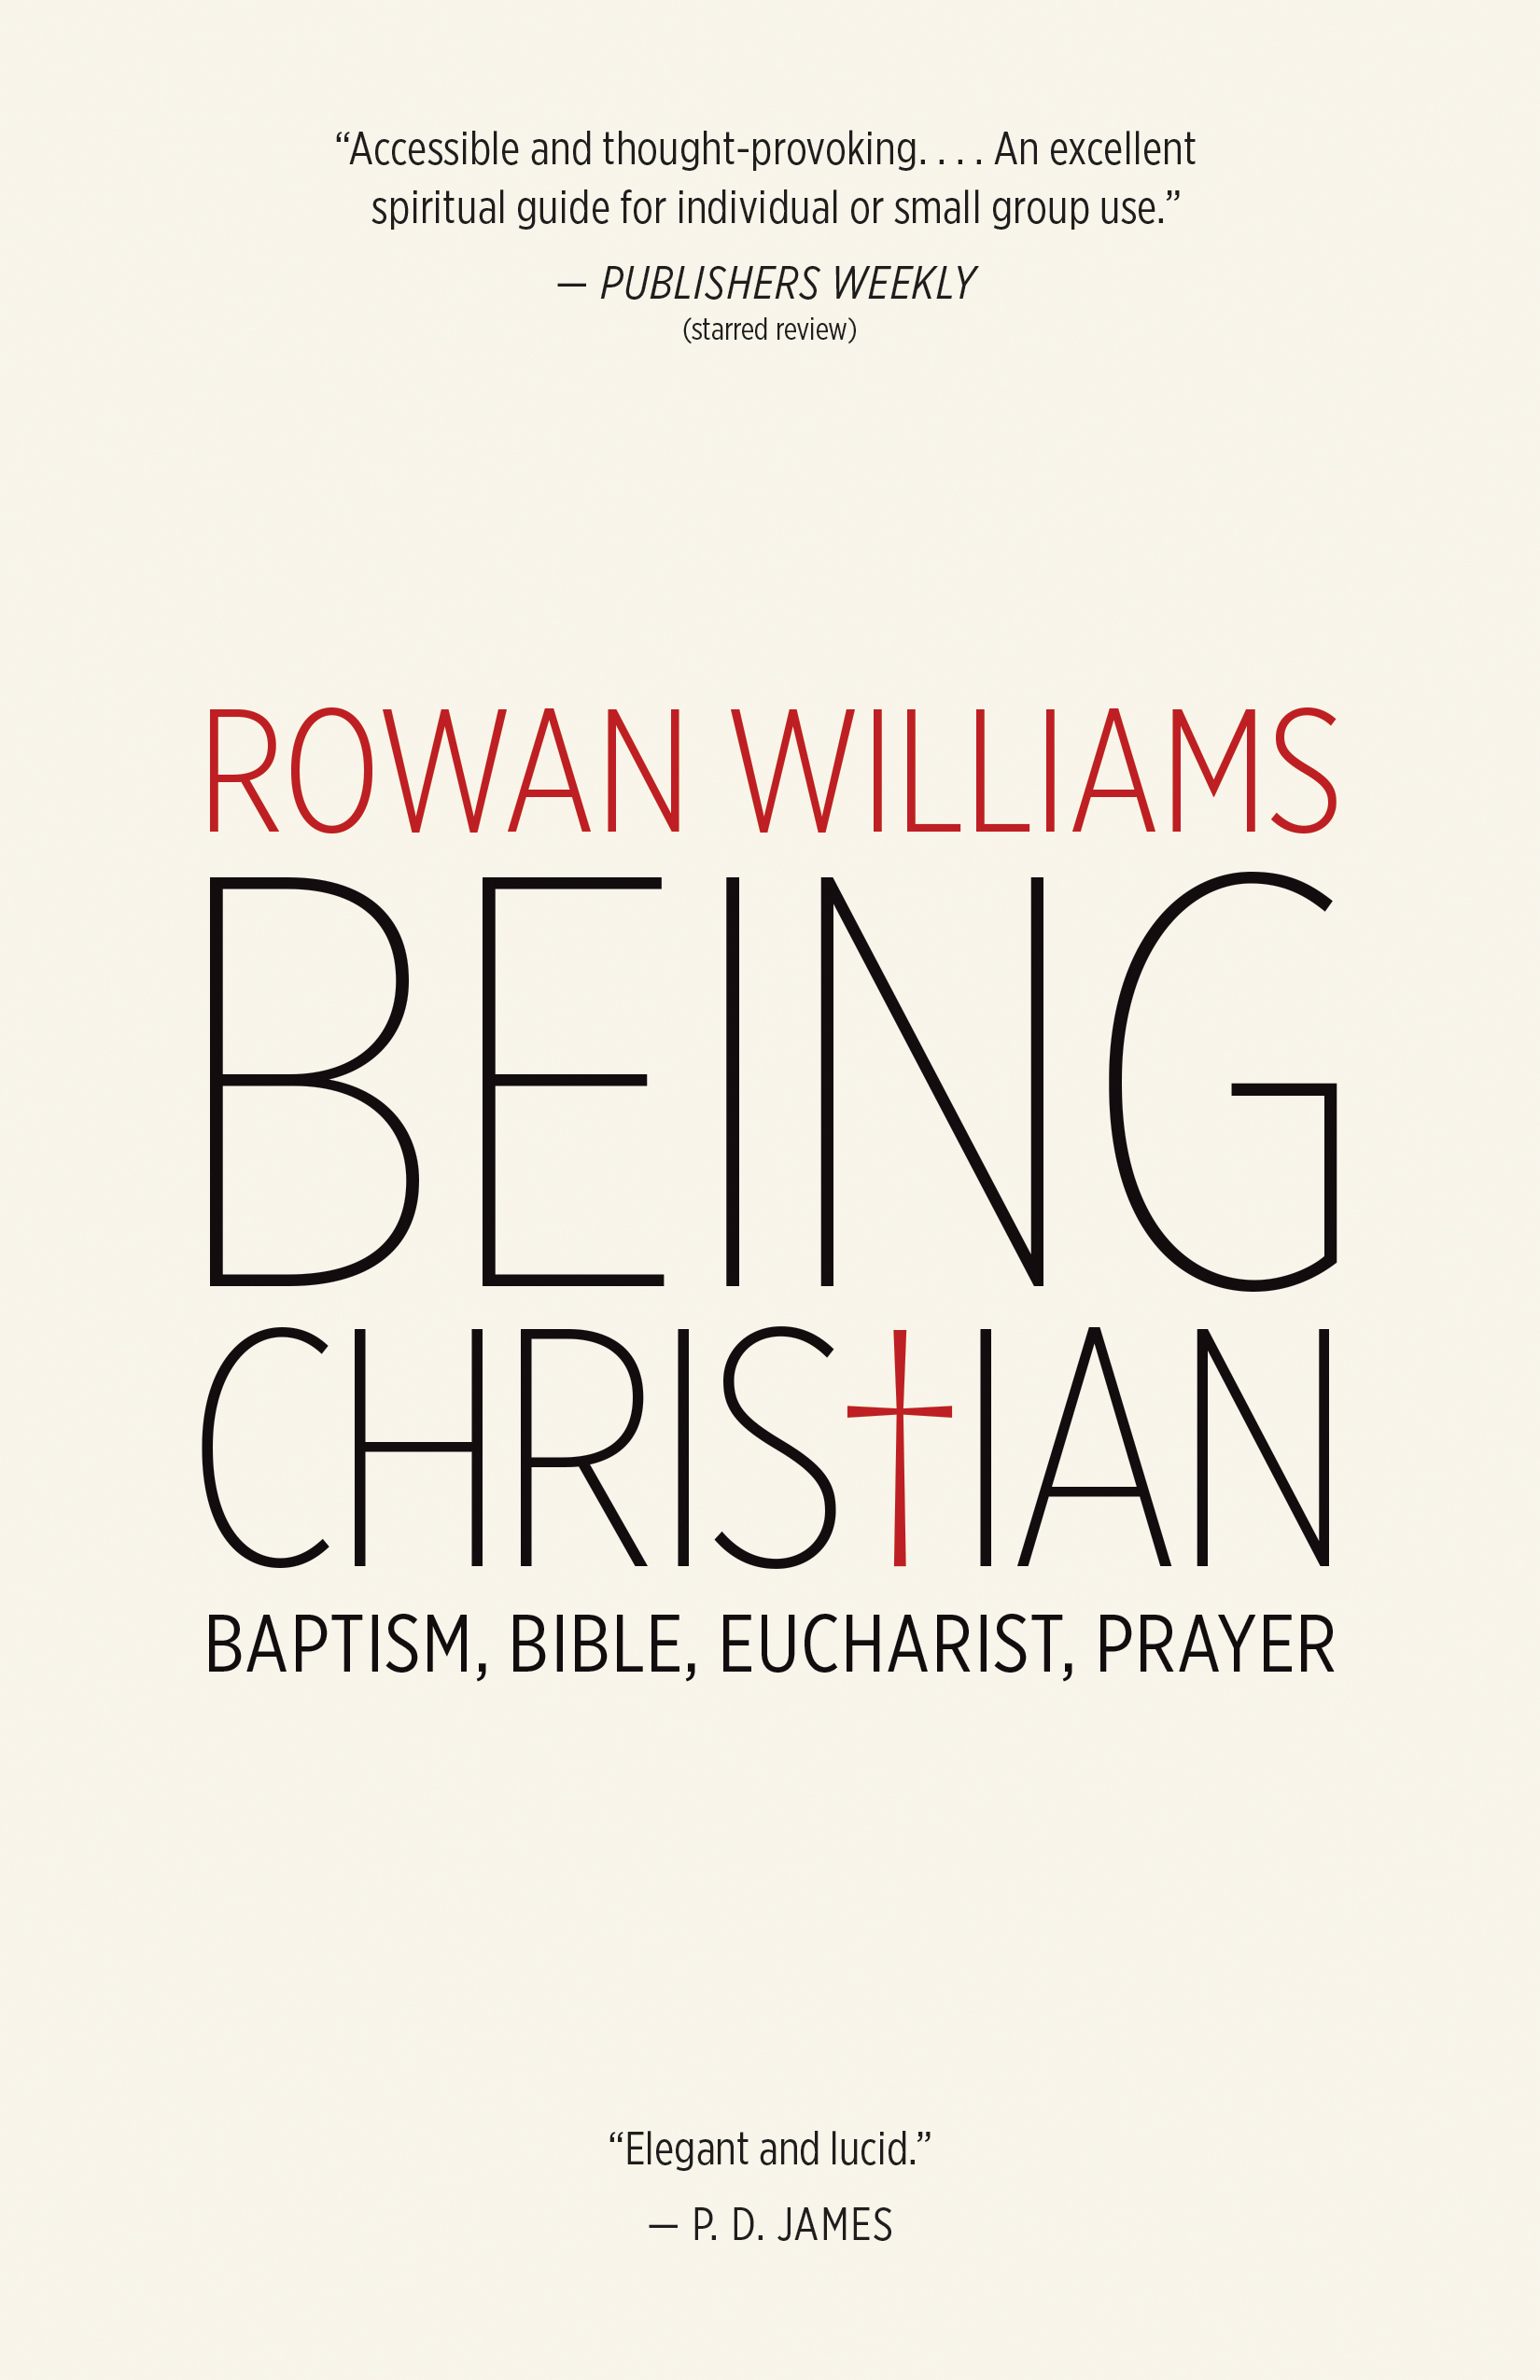 Being Christian: Baptism, Bible, Eucharist, Prayer   Rowan Williams